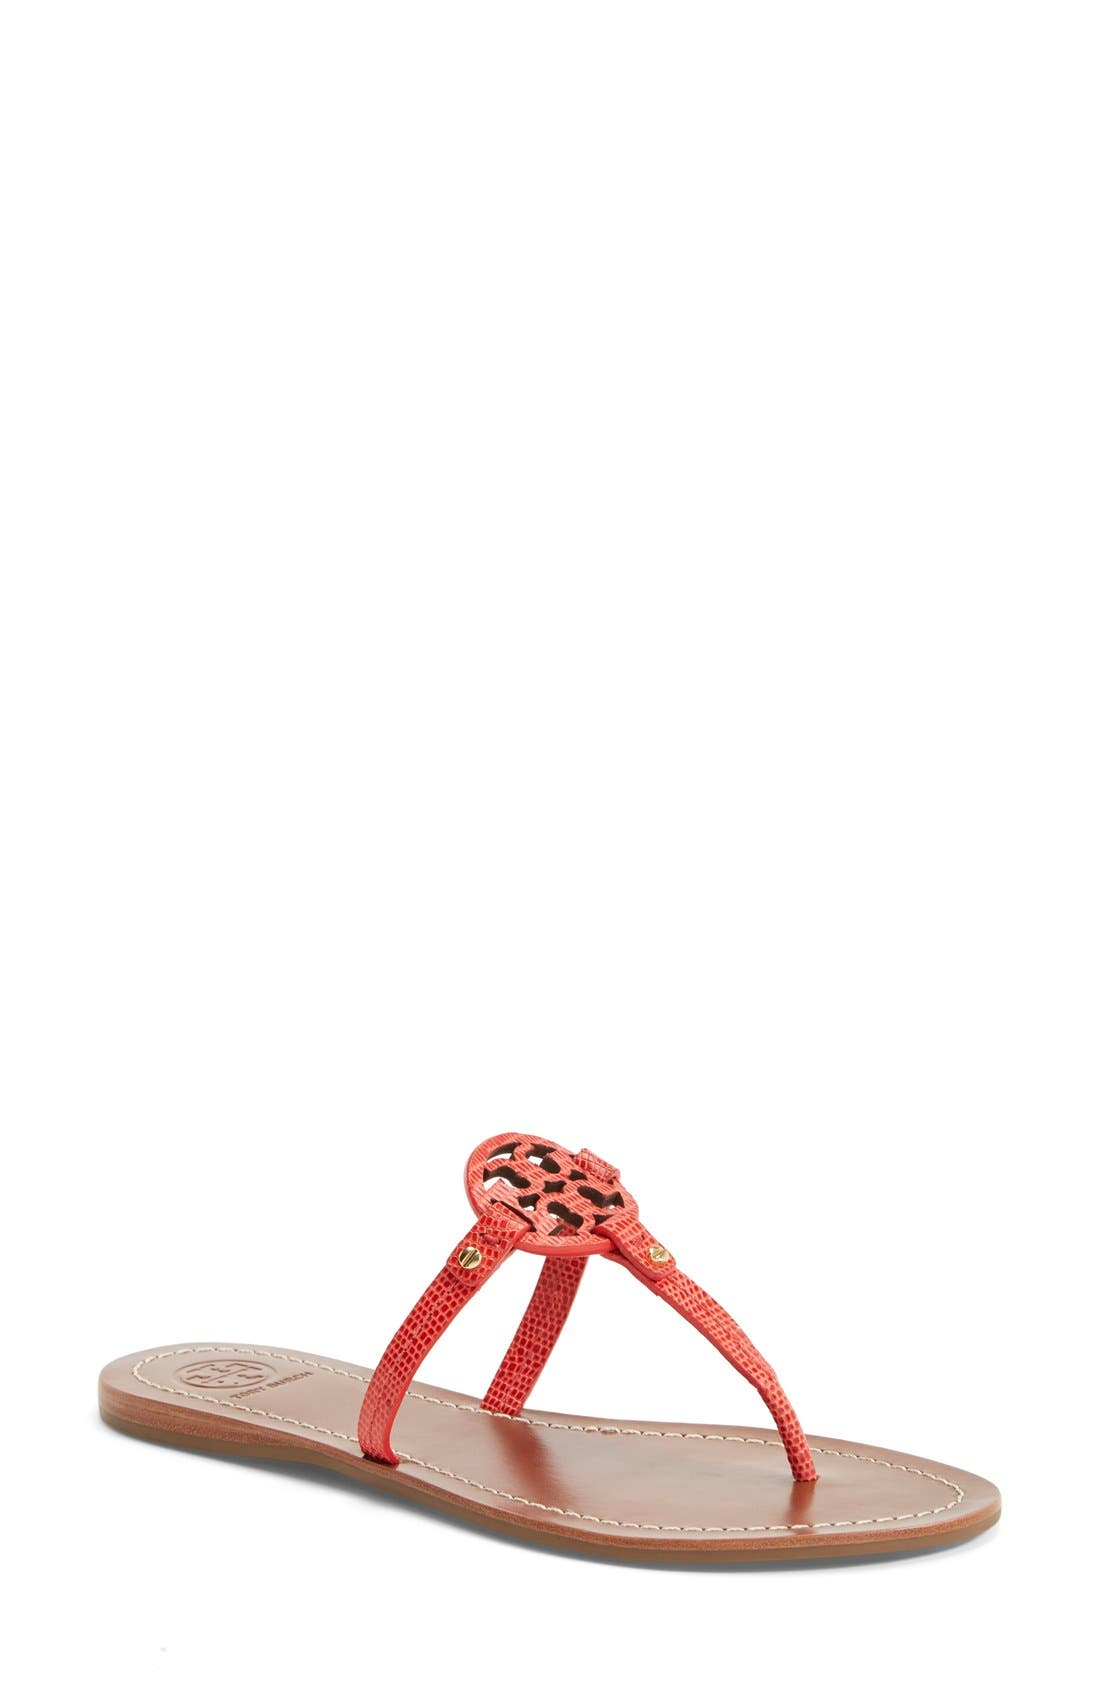 Main Image - Tory Burch 'Mini Miller' Leather Thong Sandal (Women)